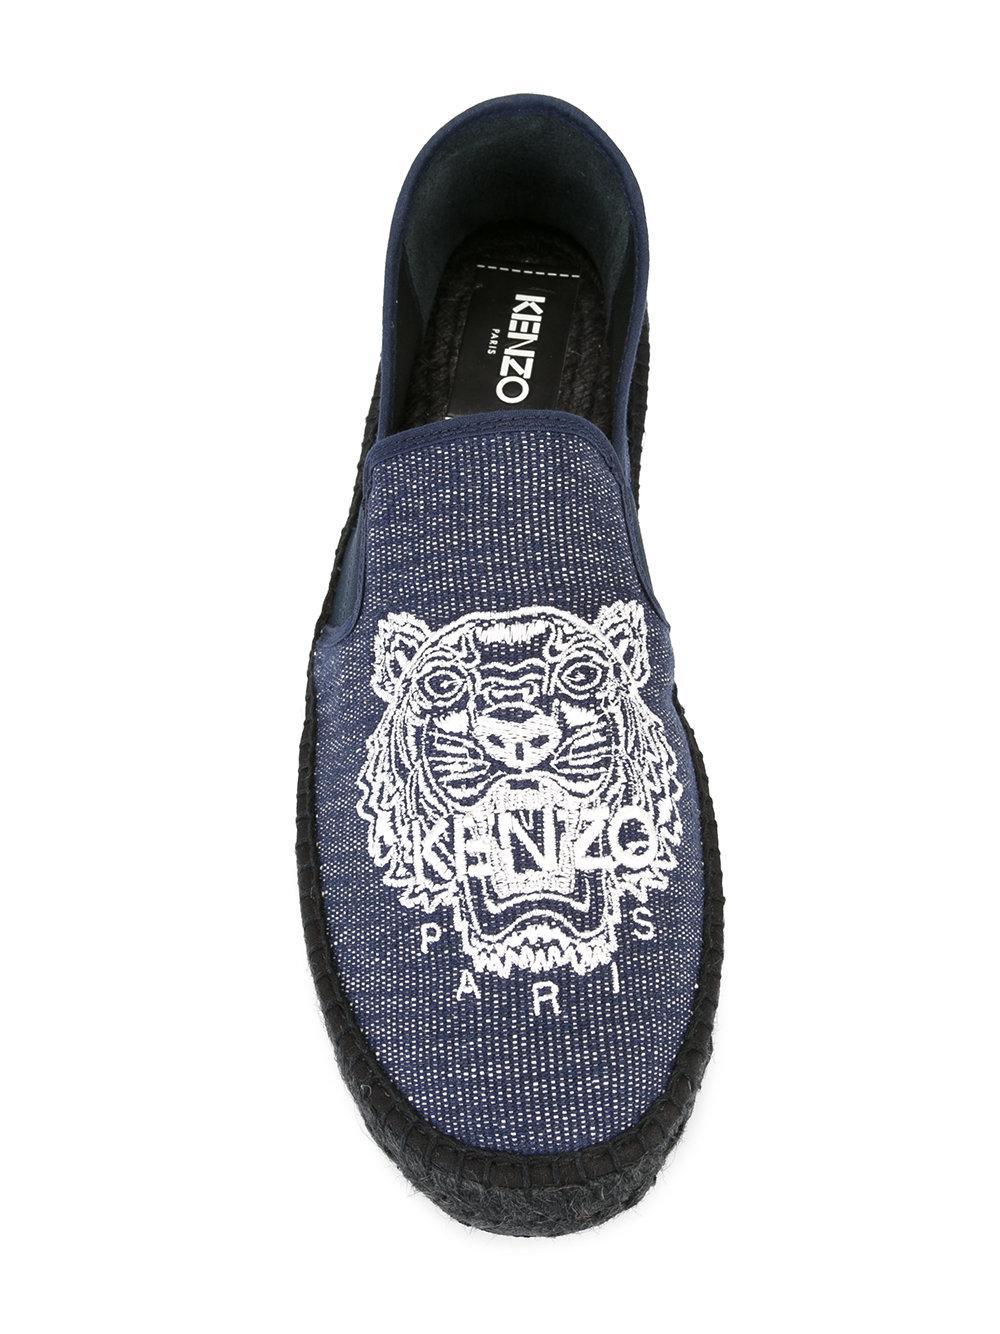 KENZO Cotton Tiger Espadrilles in Blue for Men